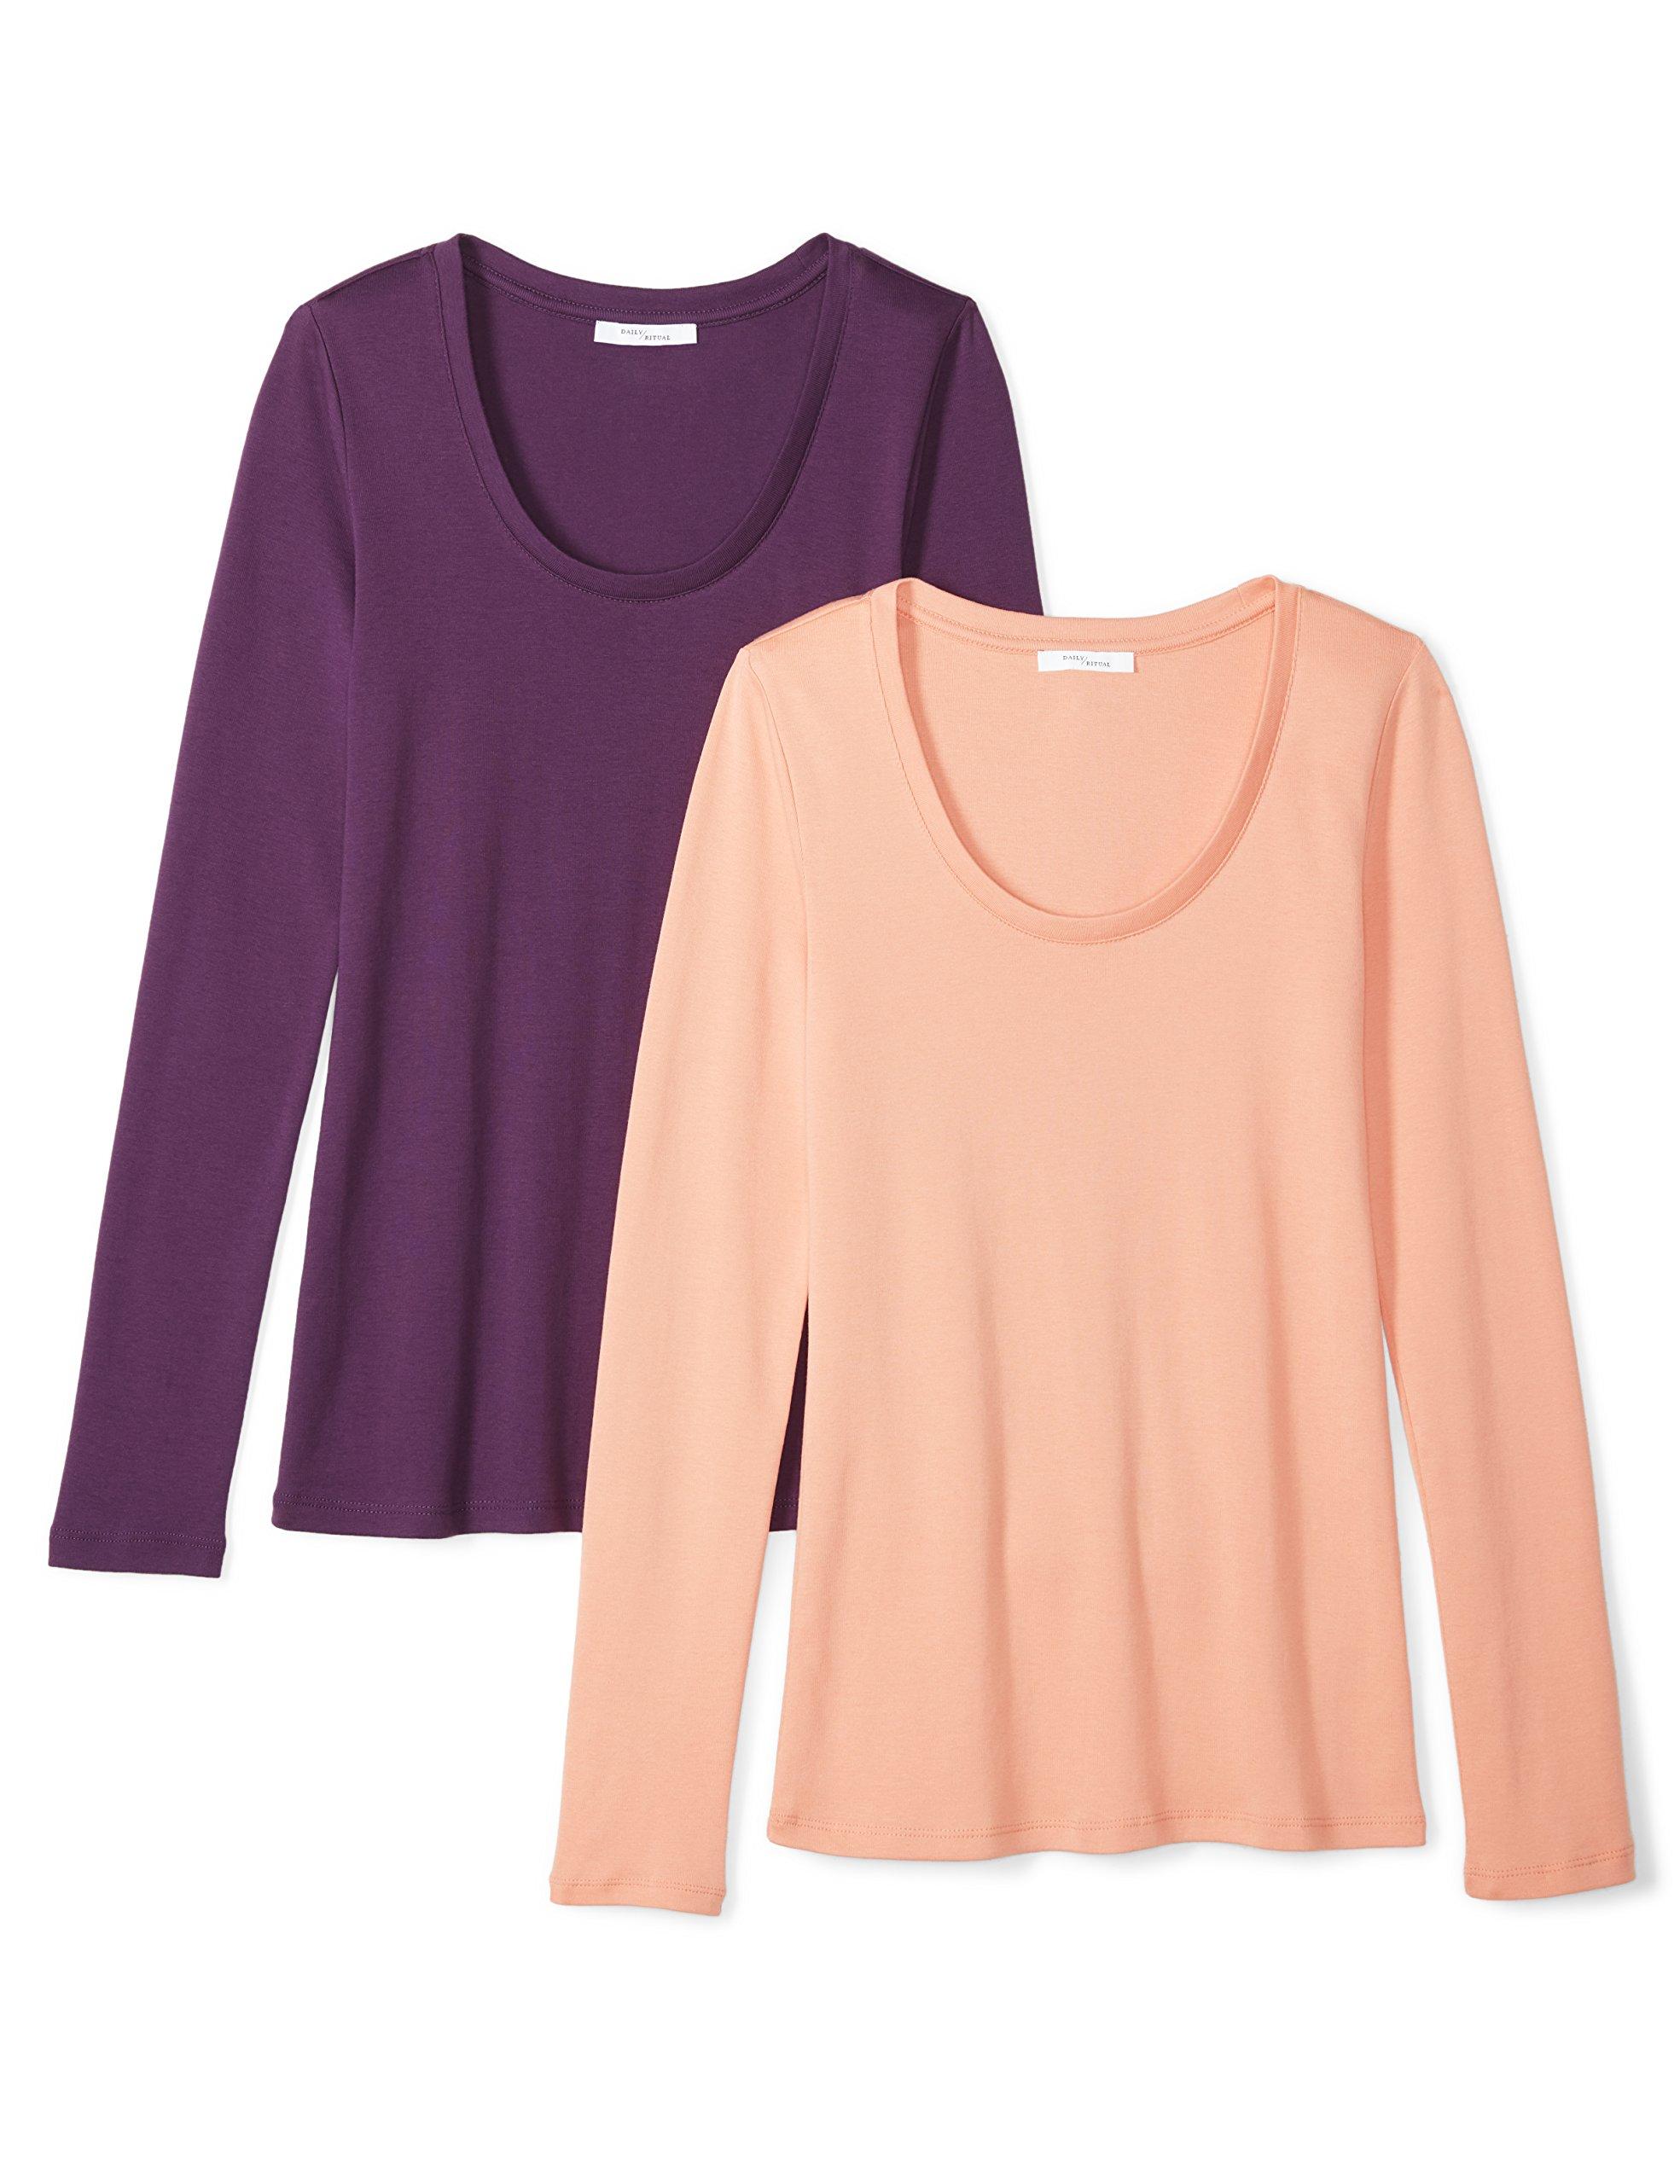 Daily Ritual Women's Midweight 100% Supima Cotton Rib Knit Long-Sleeve Scoop Neck T-Shirt, 2-Pack, L, Peach/Deep Purple